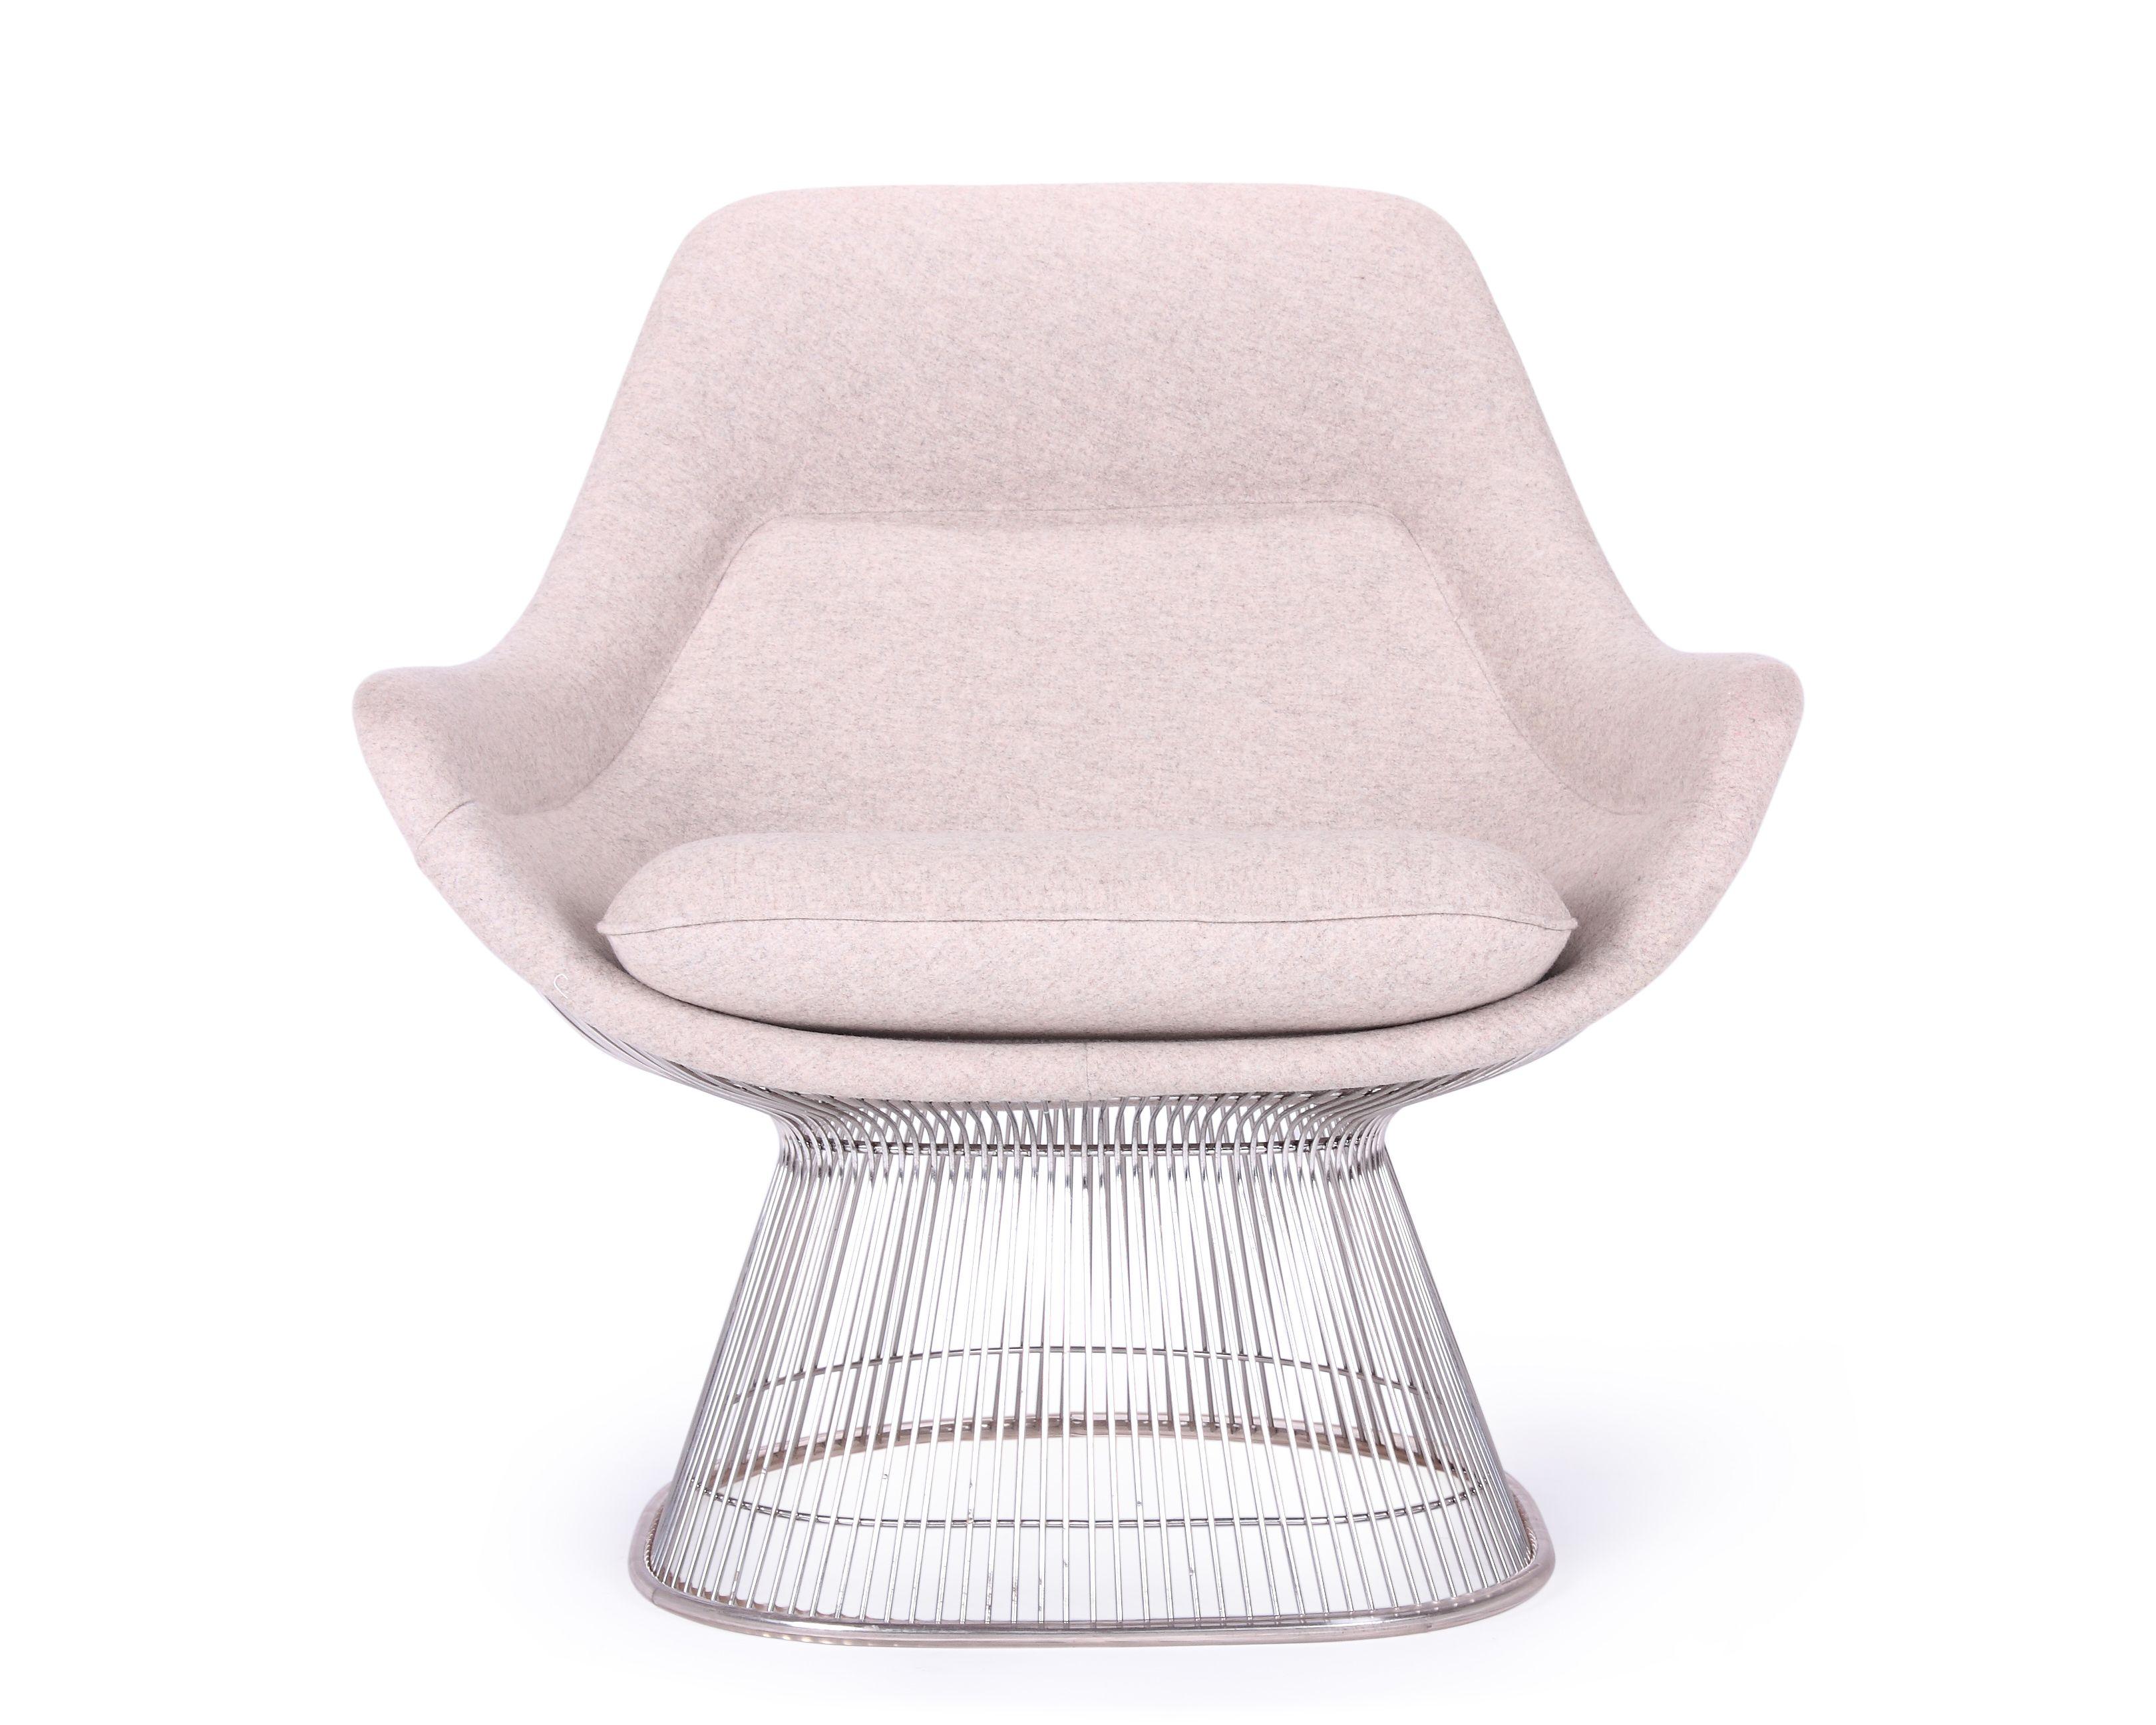 Easy does it. The Warren Platner Easy Chair